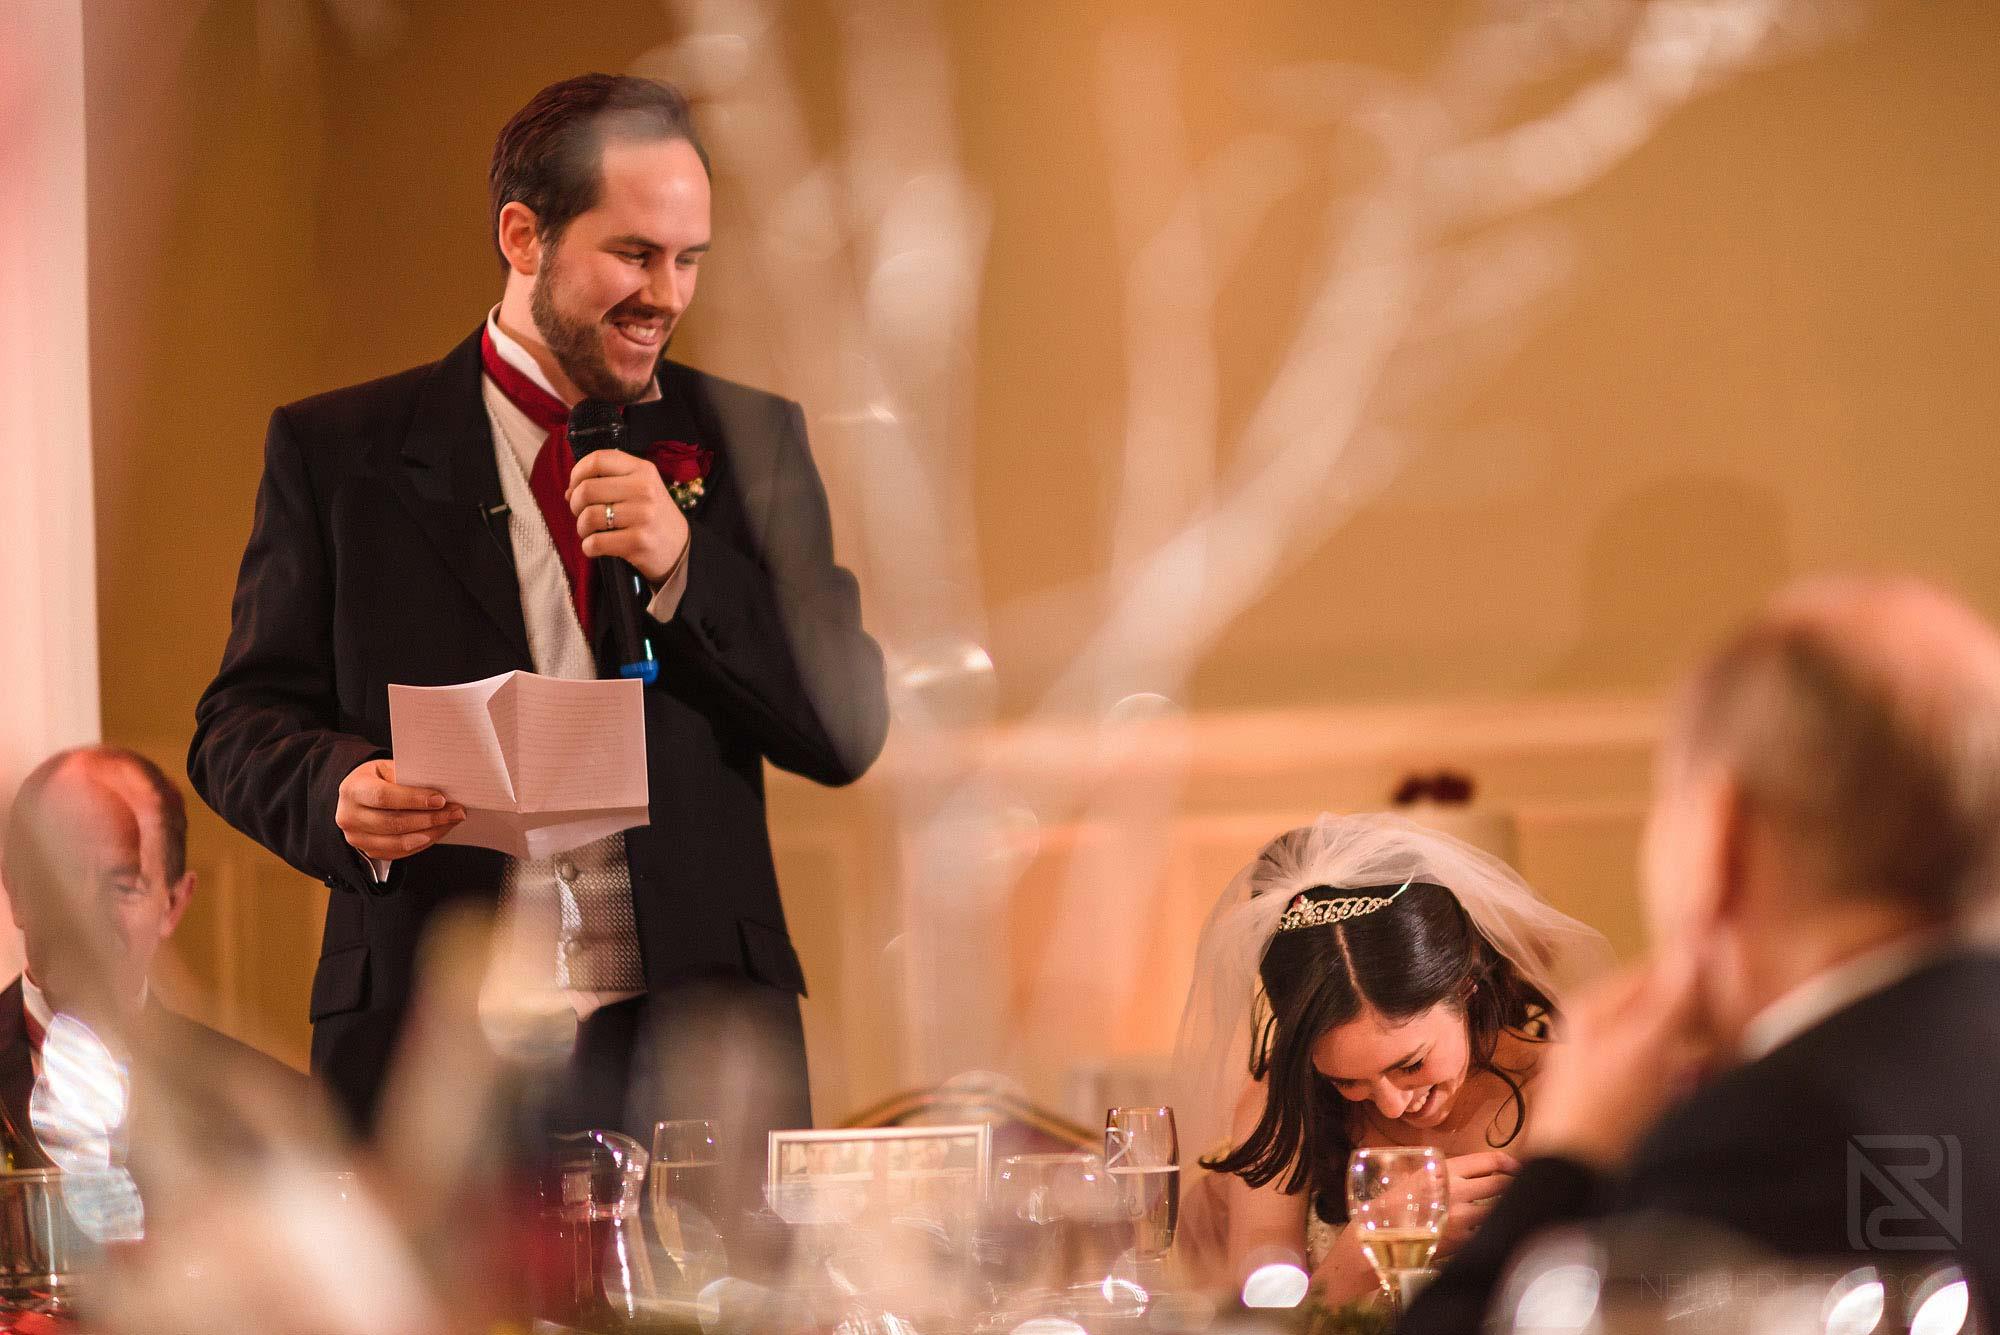 bride laughing during groom's wedding speech